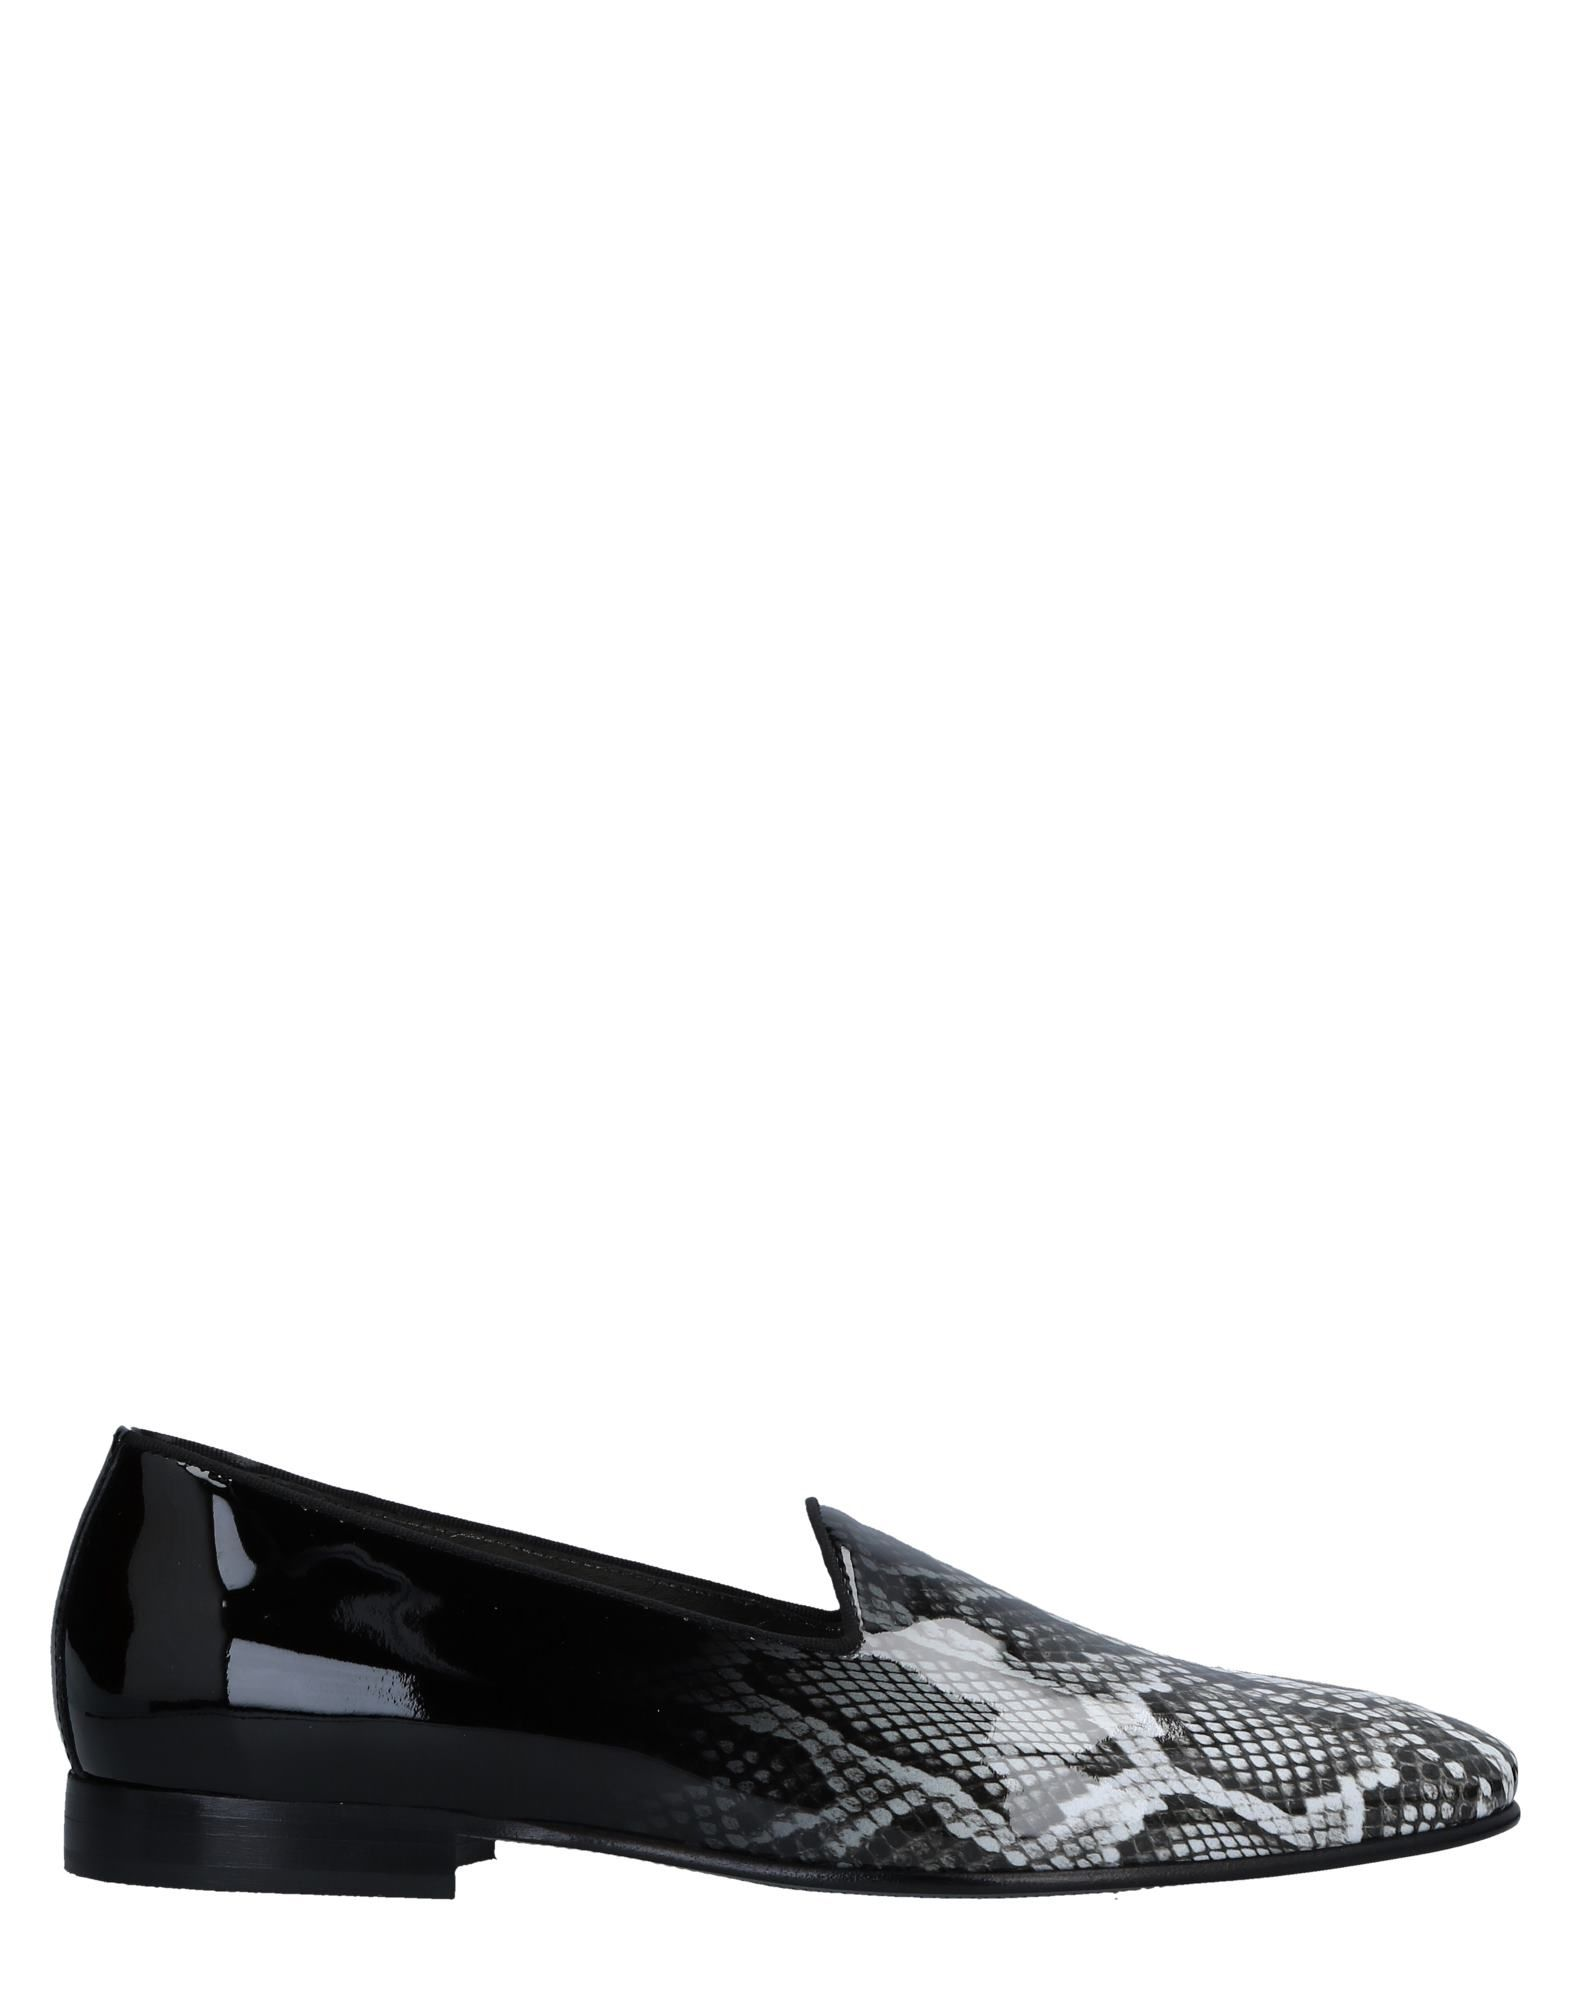 Michel Simon Mokassins Herren  11519582OL Gute Qualität beliebte Schuhe